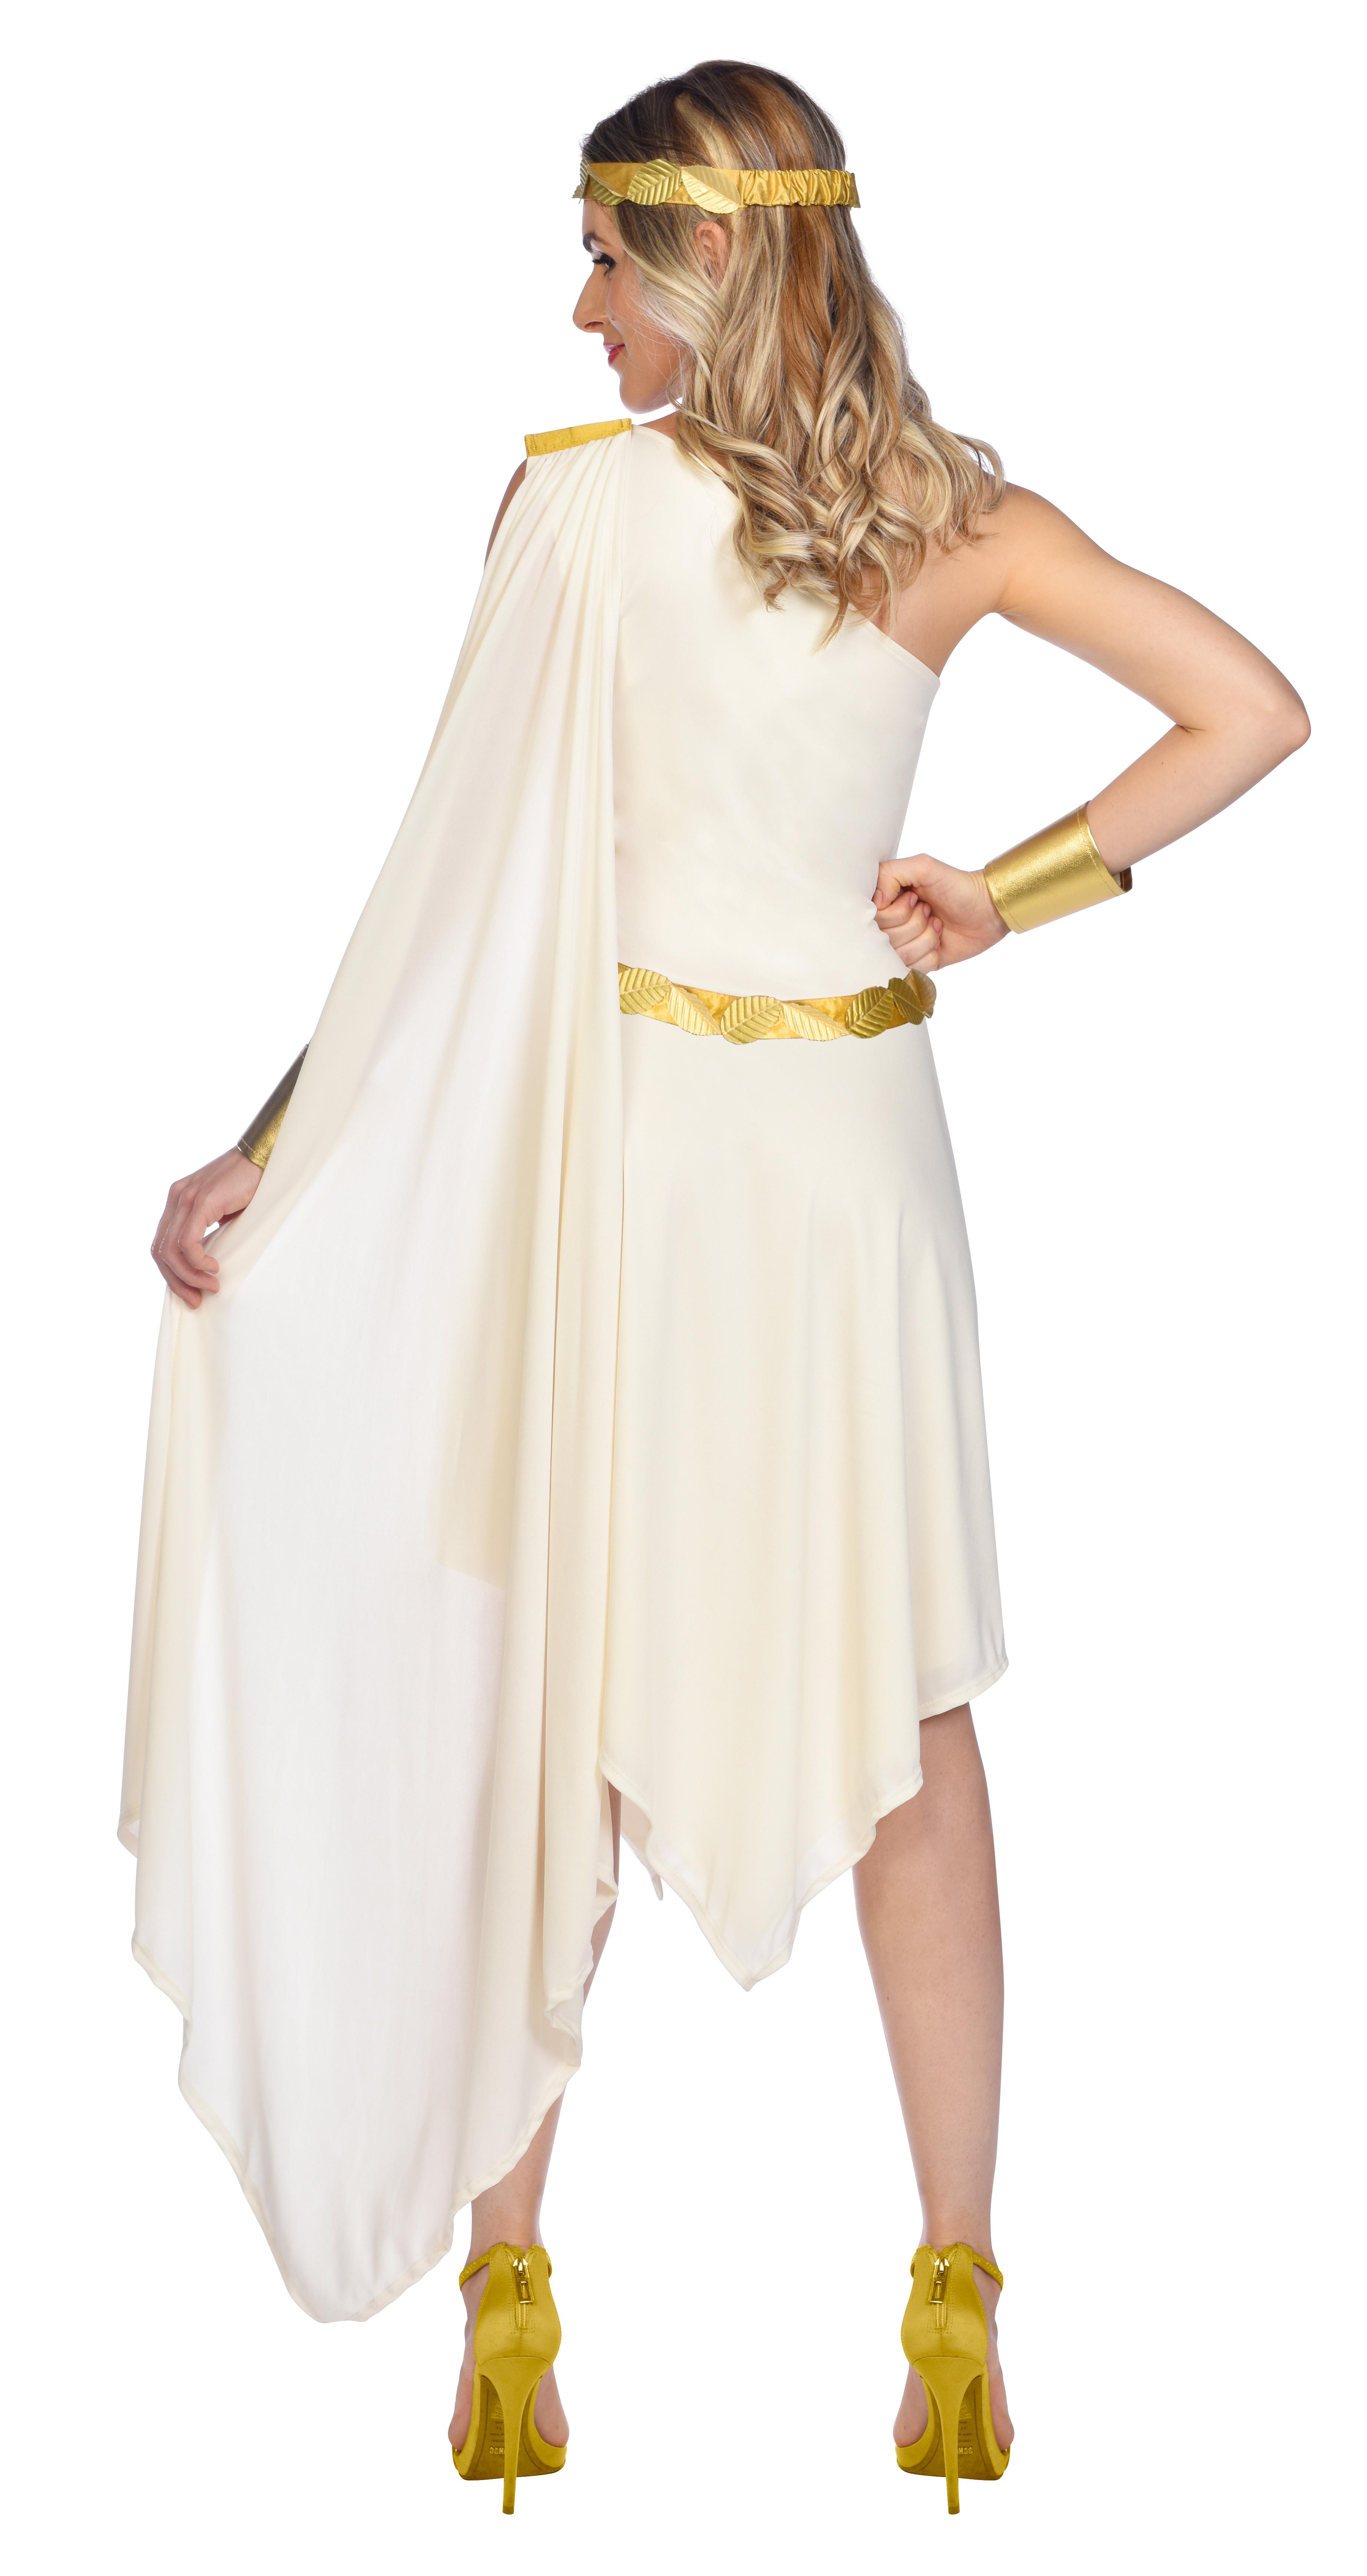 Indexbild 15 - Adult Ladies Golden Goddess Gladiator Greek Roman Toga Fancy Dress Costume New